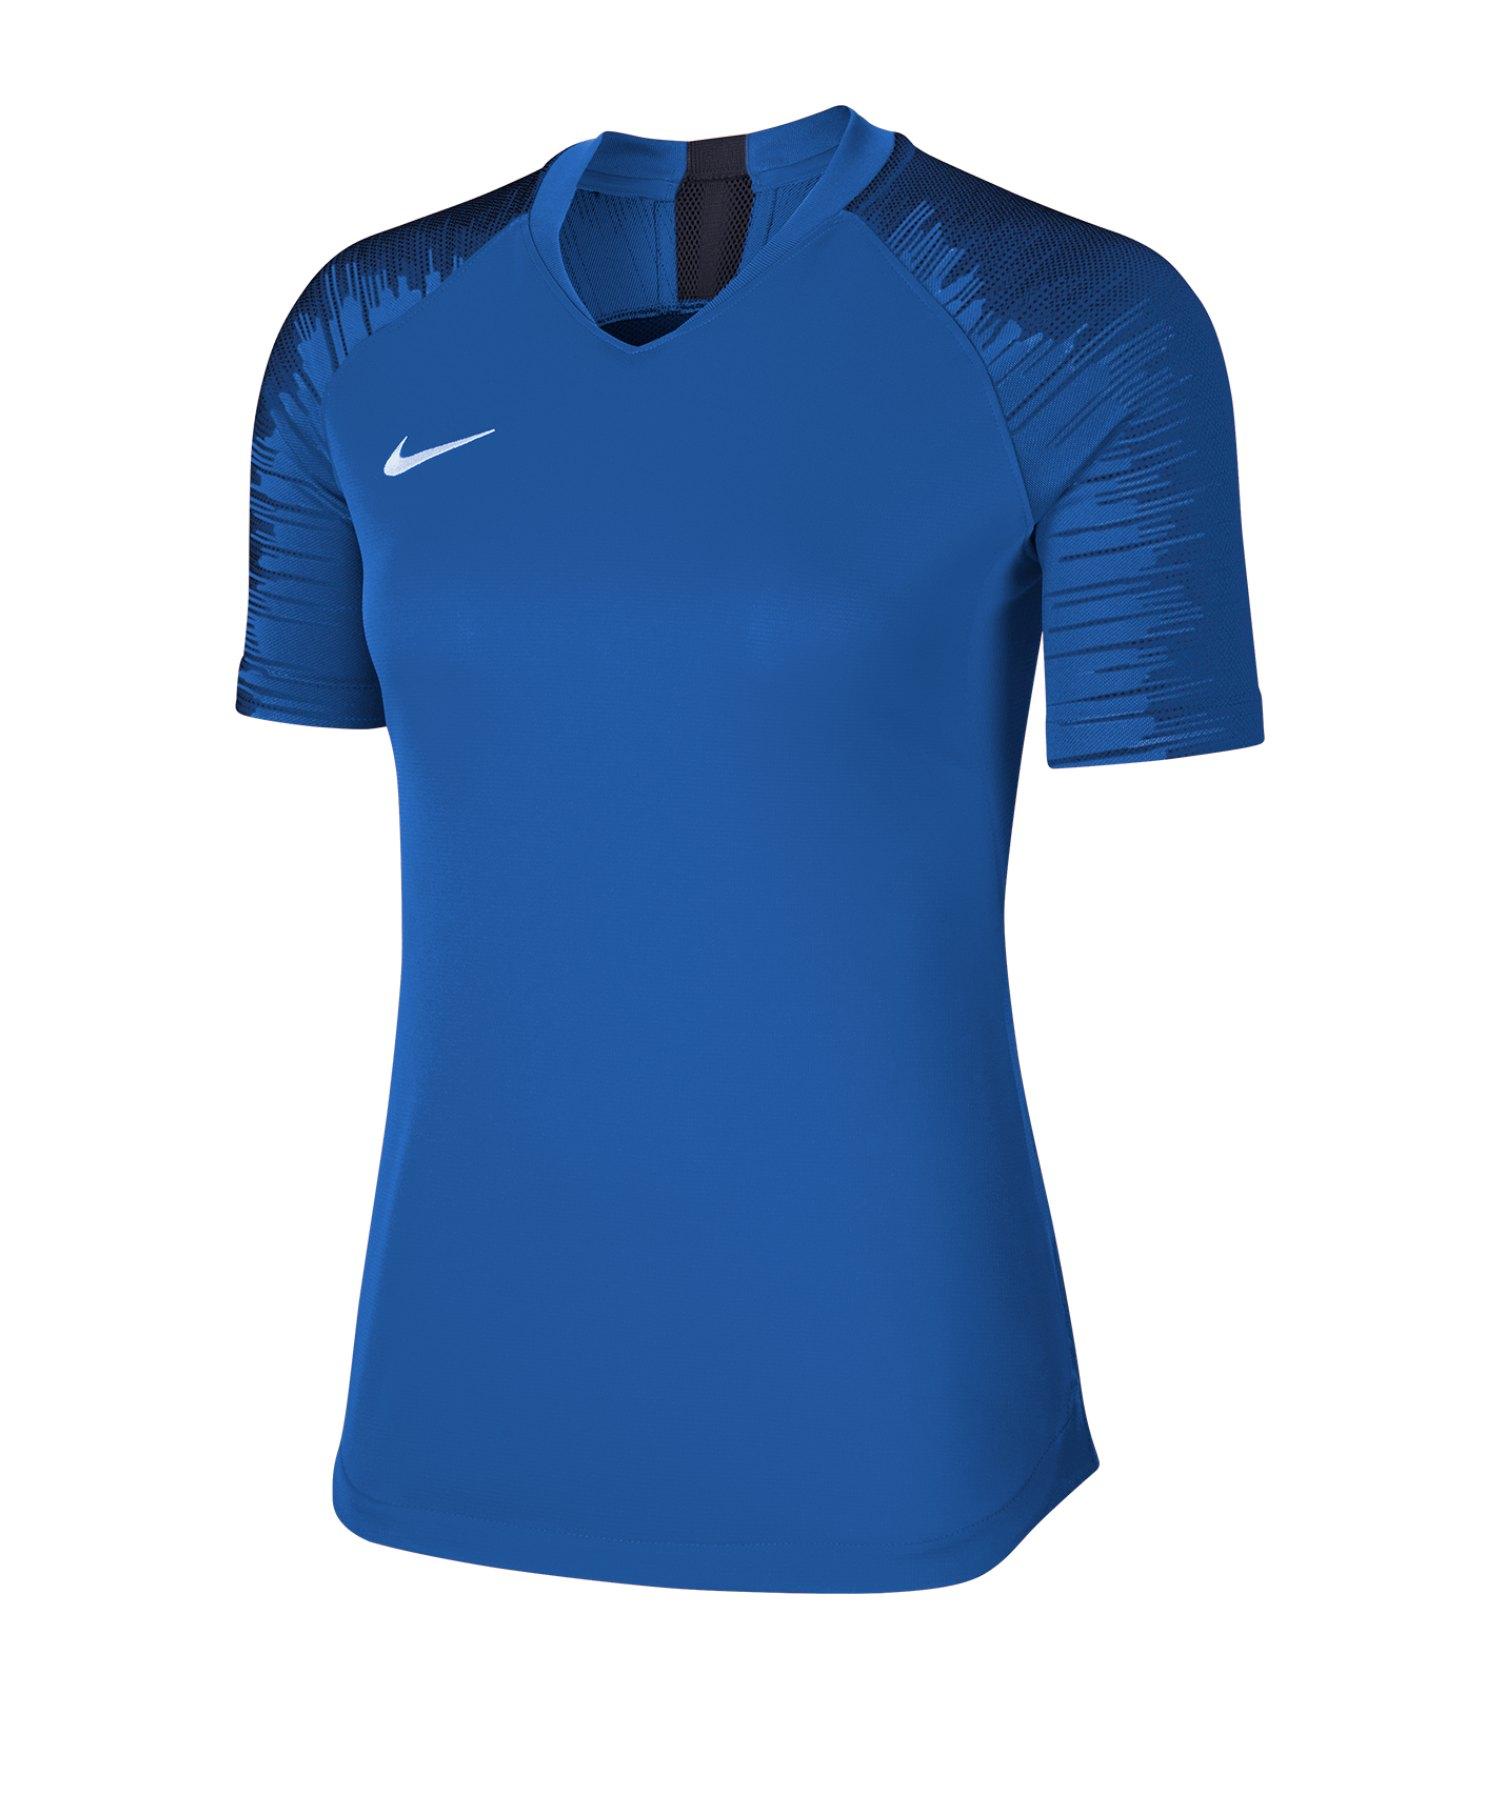 Nike Strike Trikot kurzarm Damen Blau F463 - blau